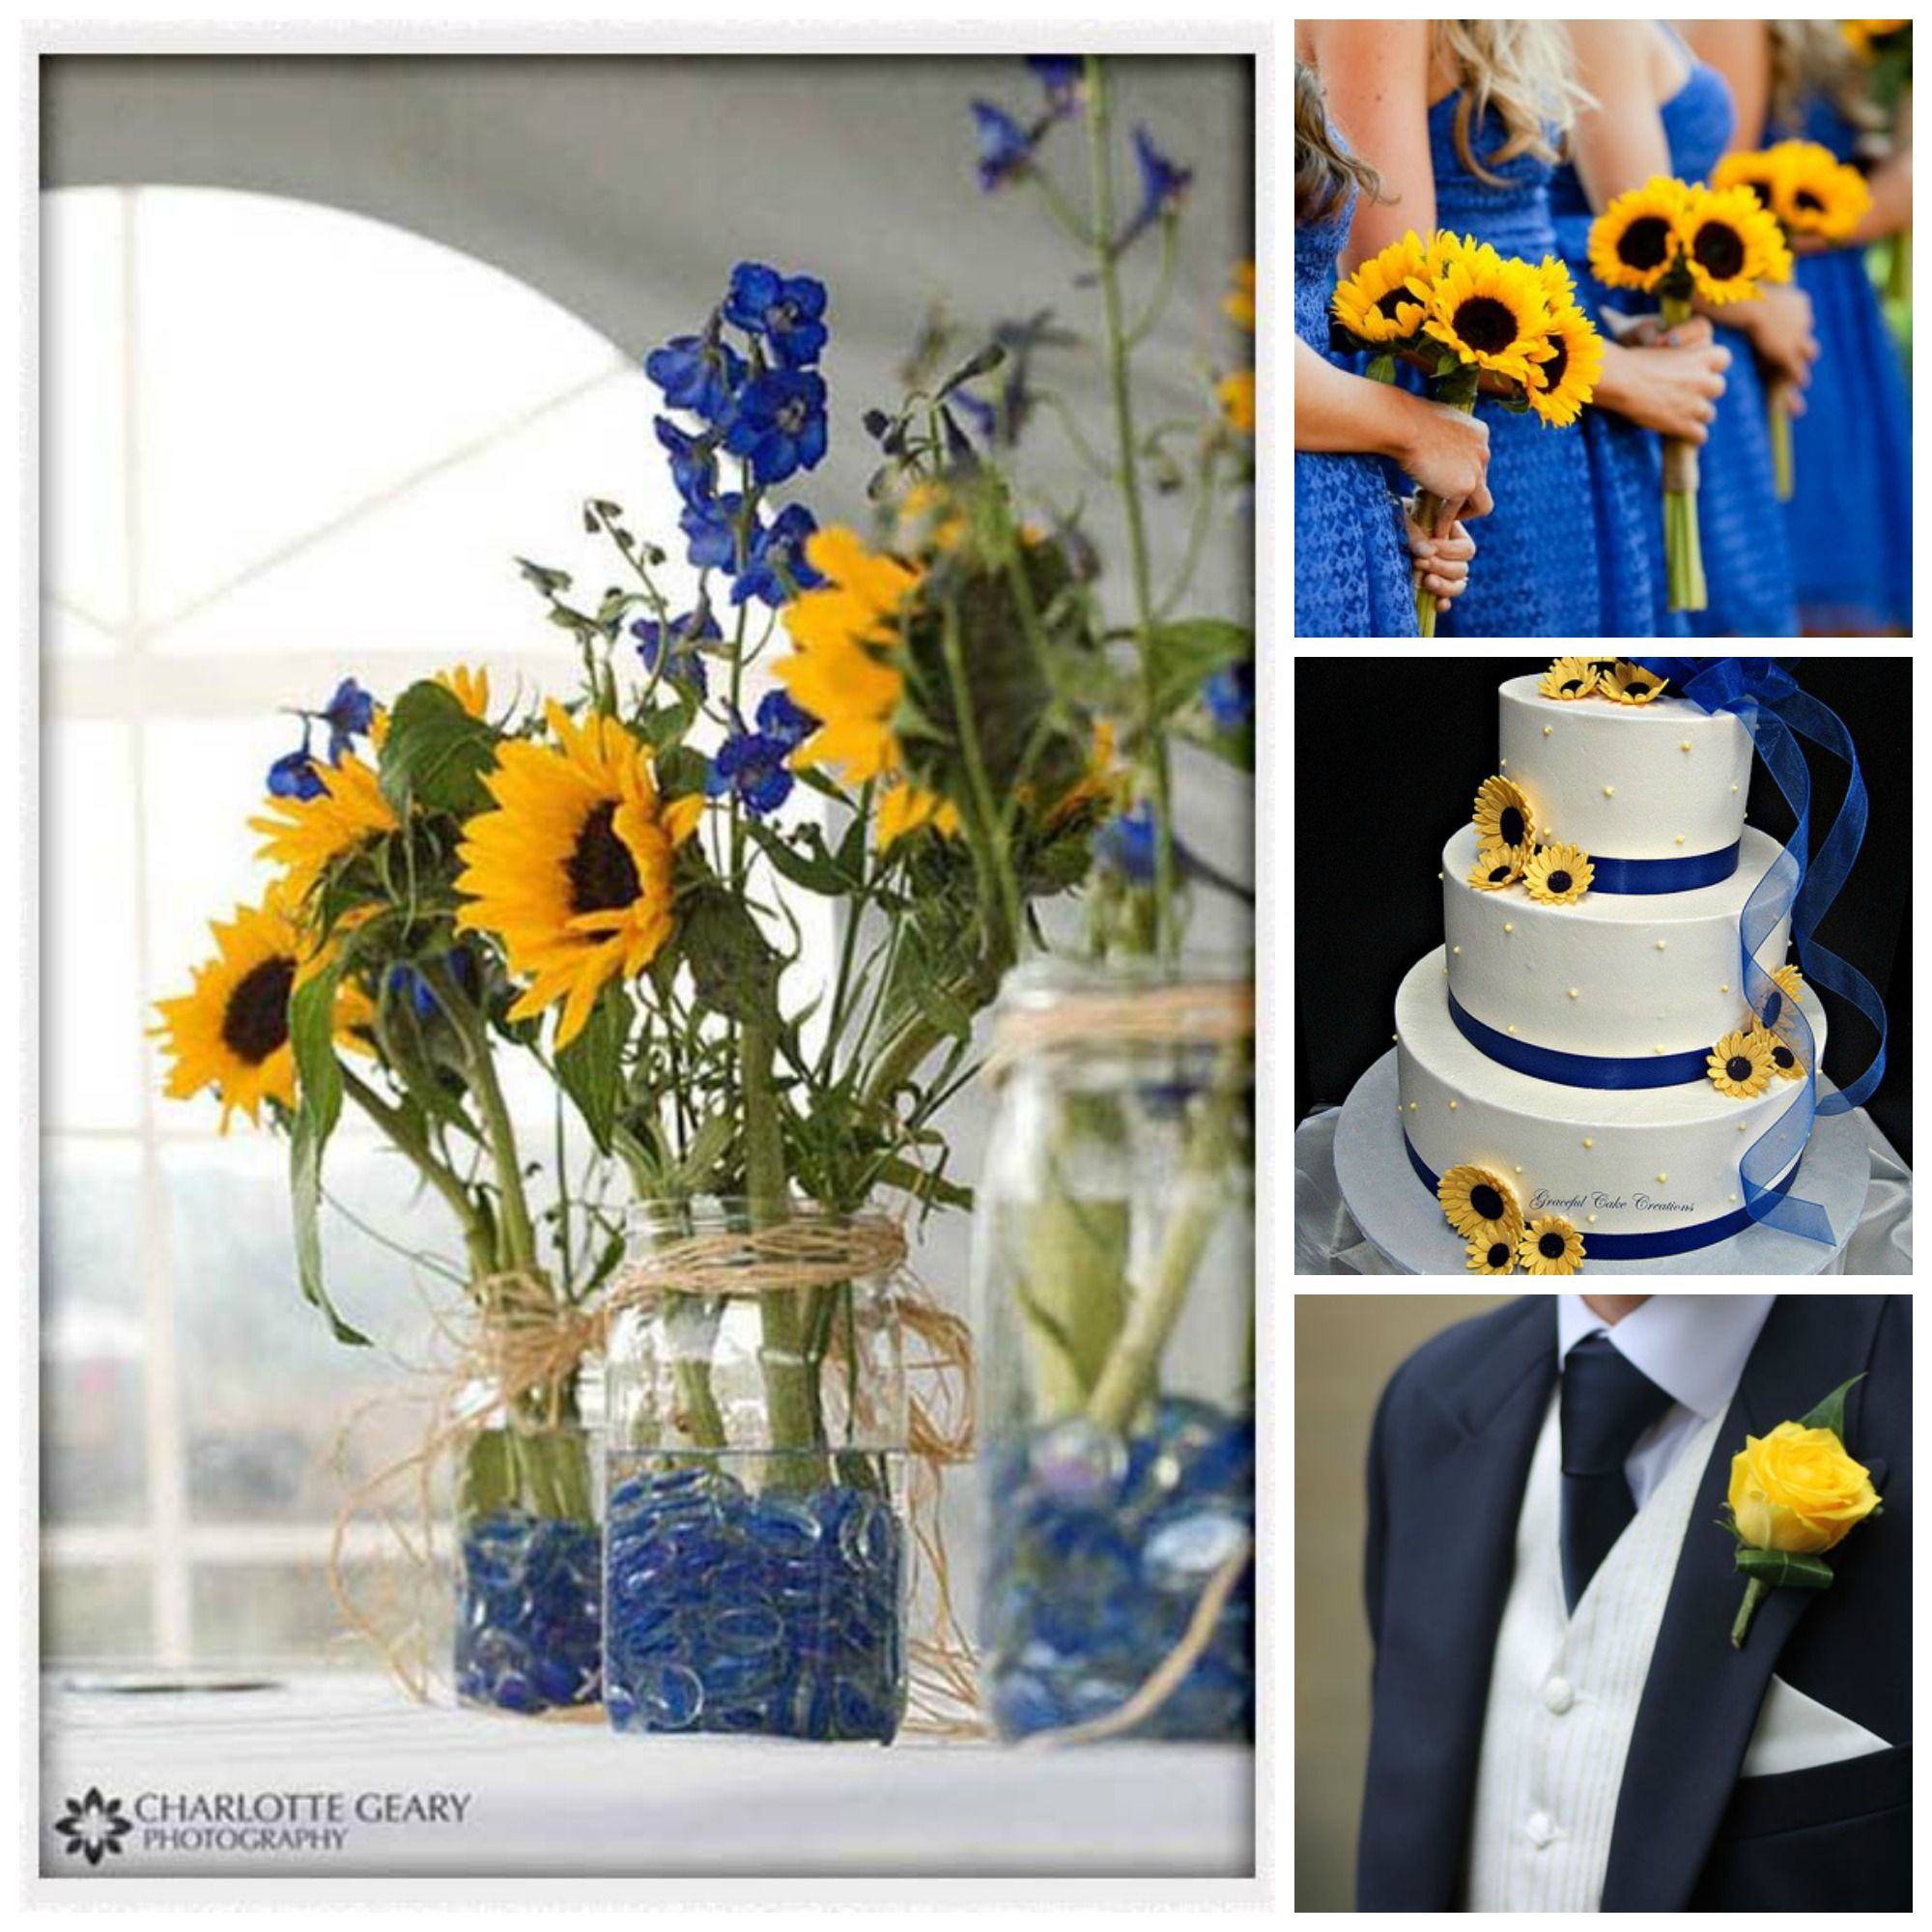 Wedding Colour Ideas Wedding Colour Palette Sunflowers And Cornf Sunflower Wedding Centerpieces Sunflower Wedding Decorations Wedding Reception Centerpieces